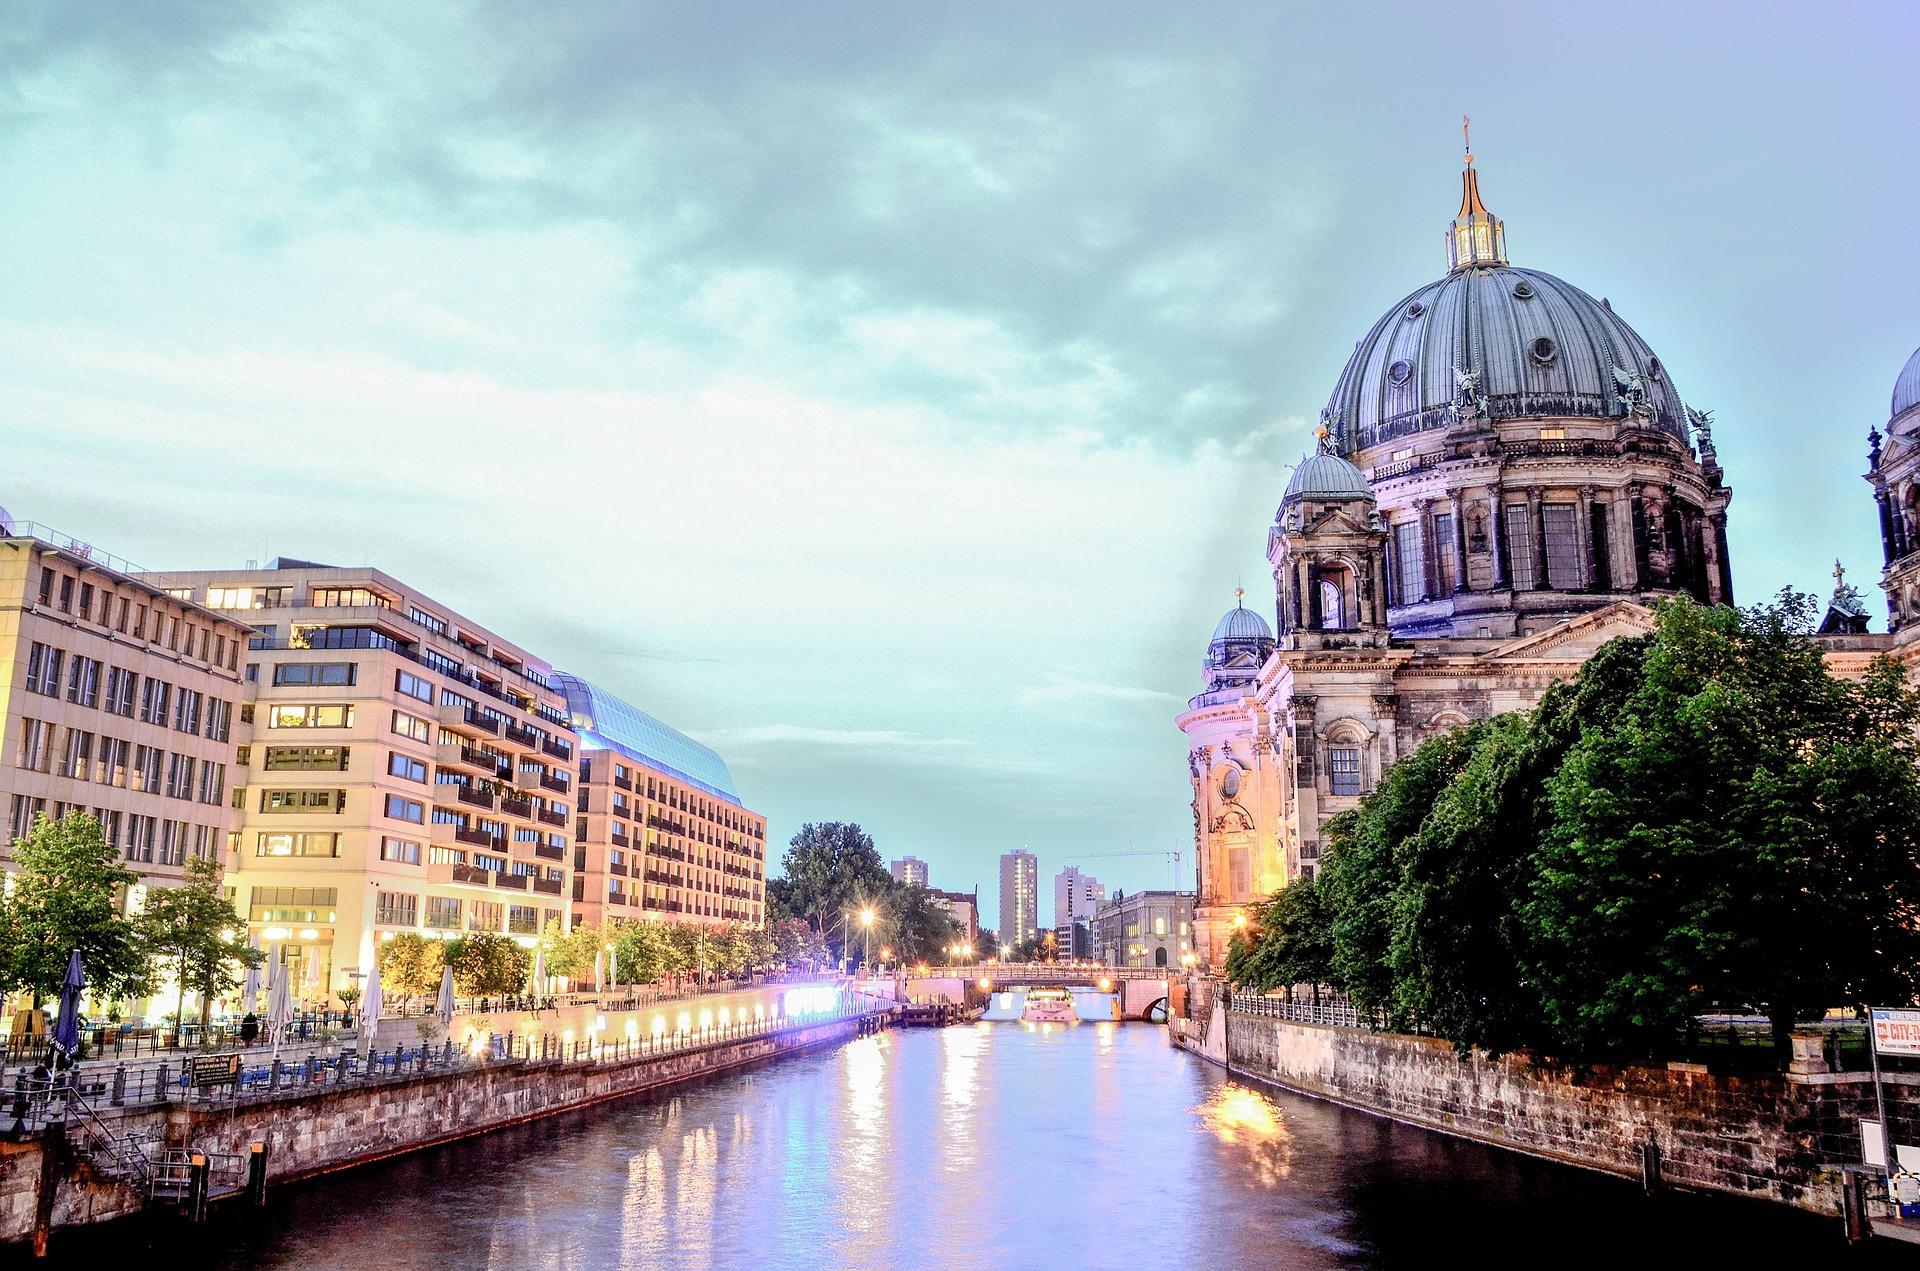 berlin-cathedral-1882397_1920.jpg